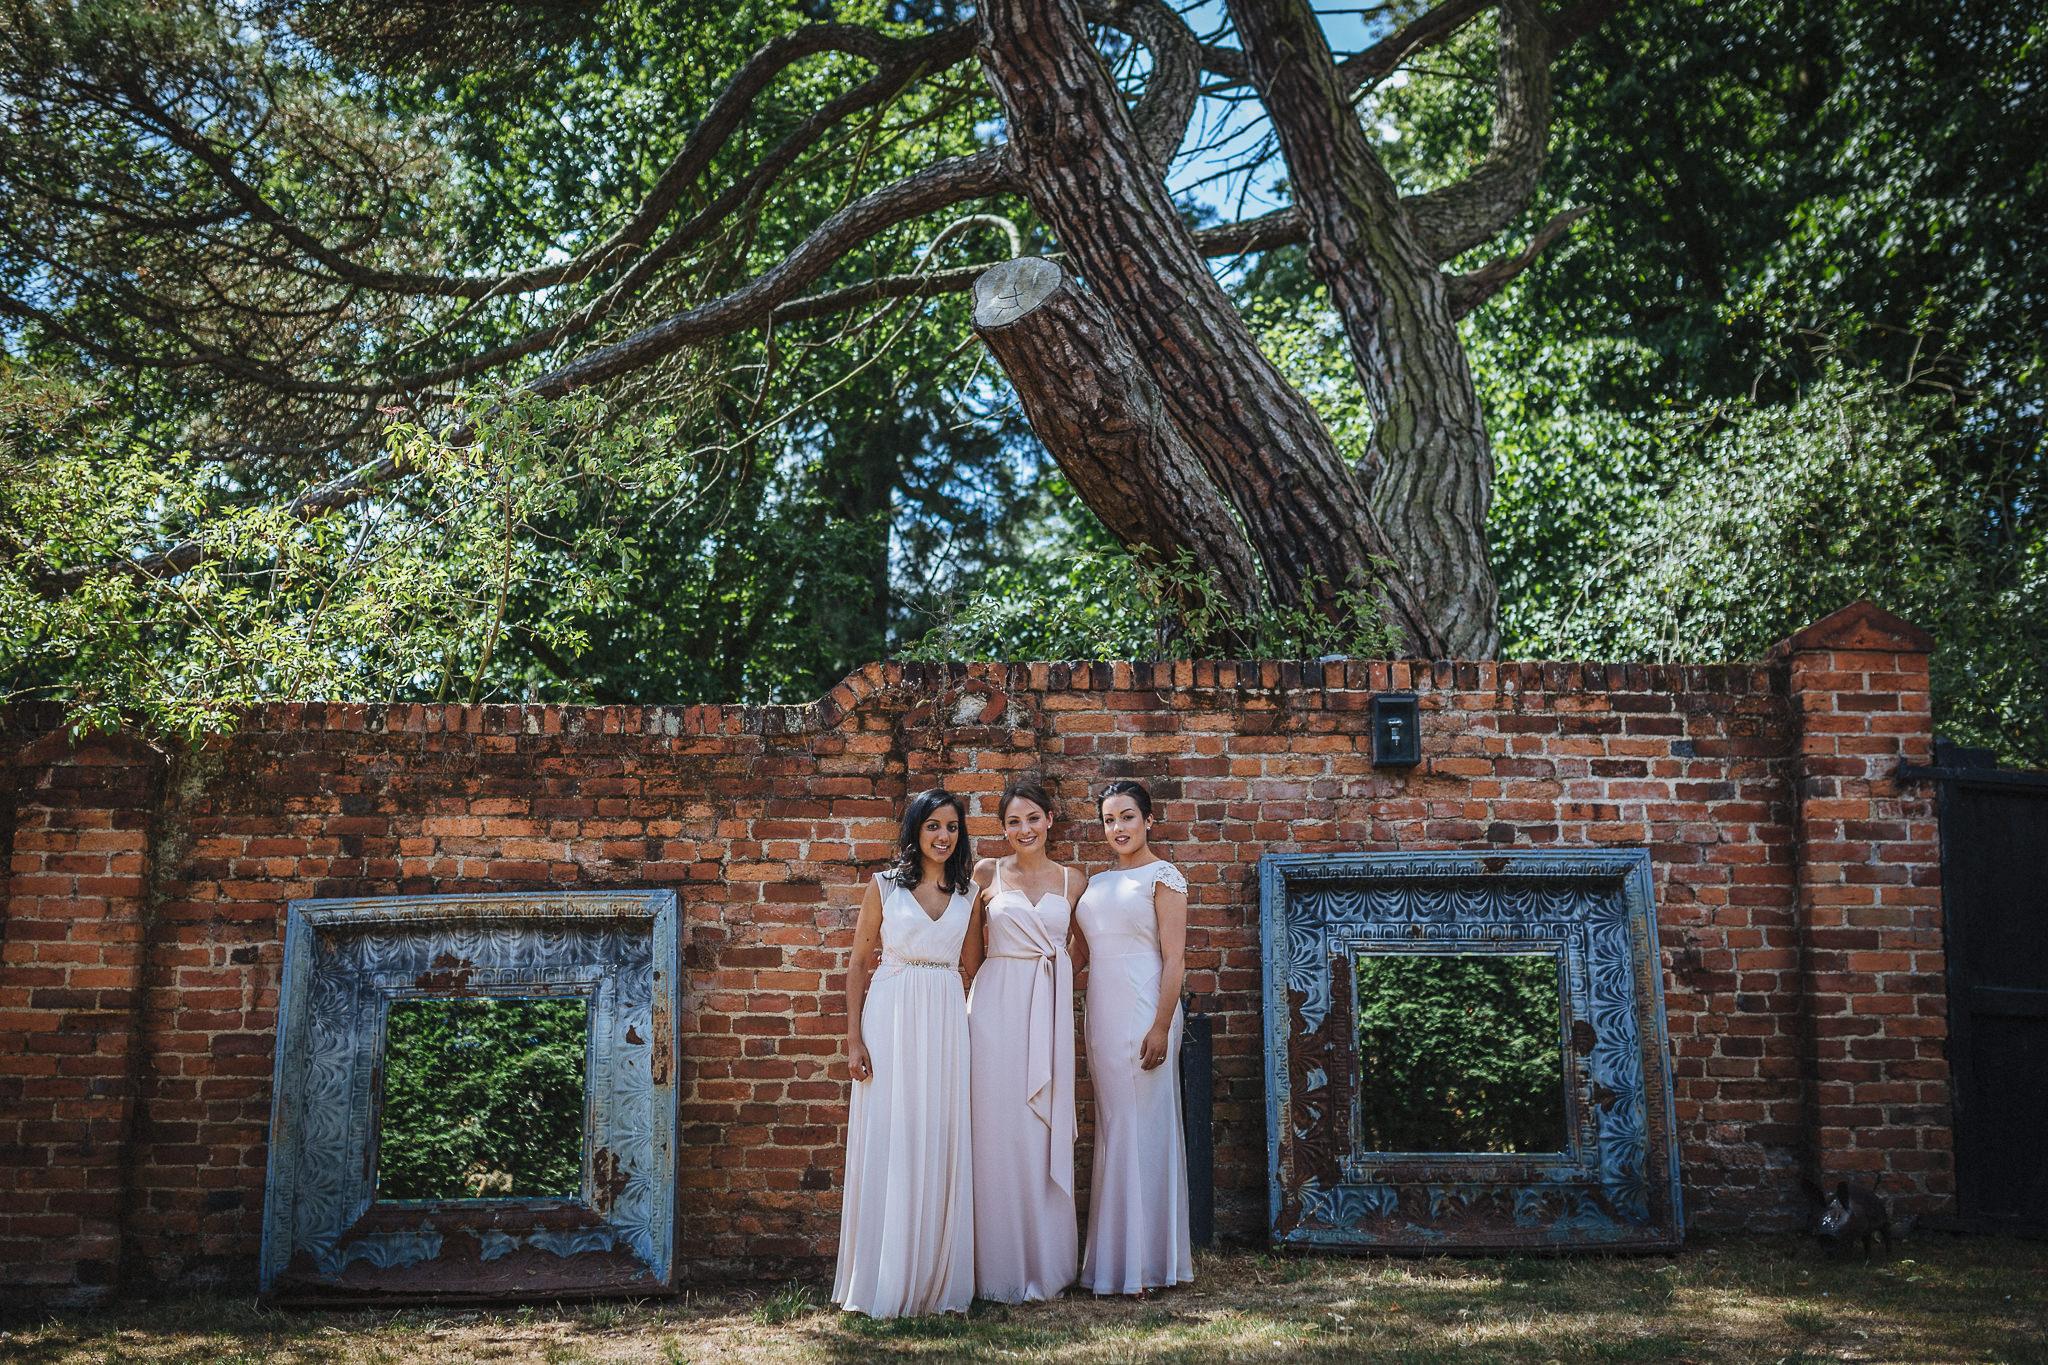 paul-marbrook-Gaynes-Park Wedding-Photographer-90031